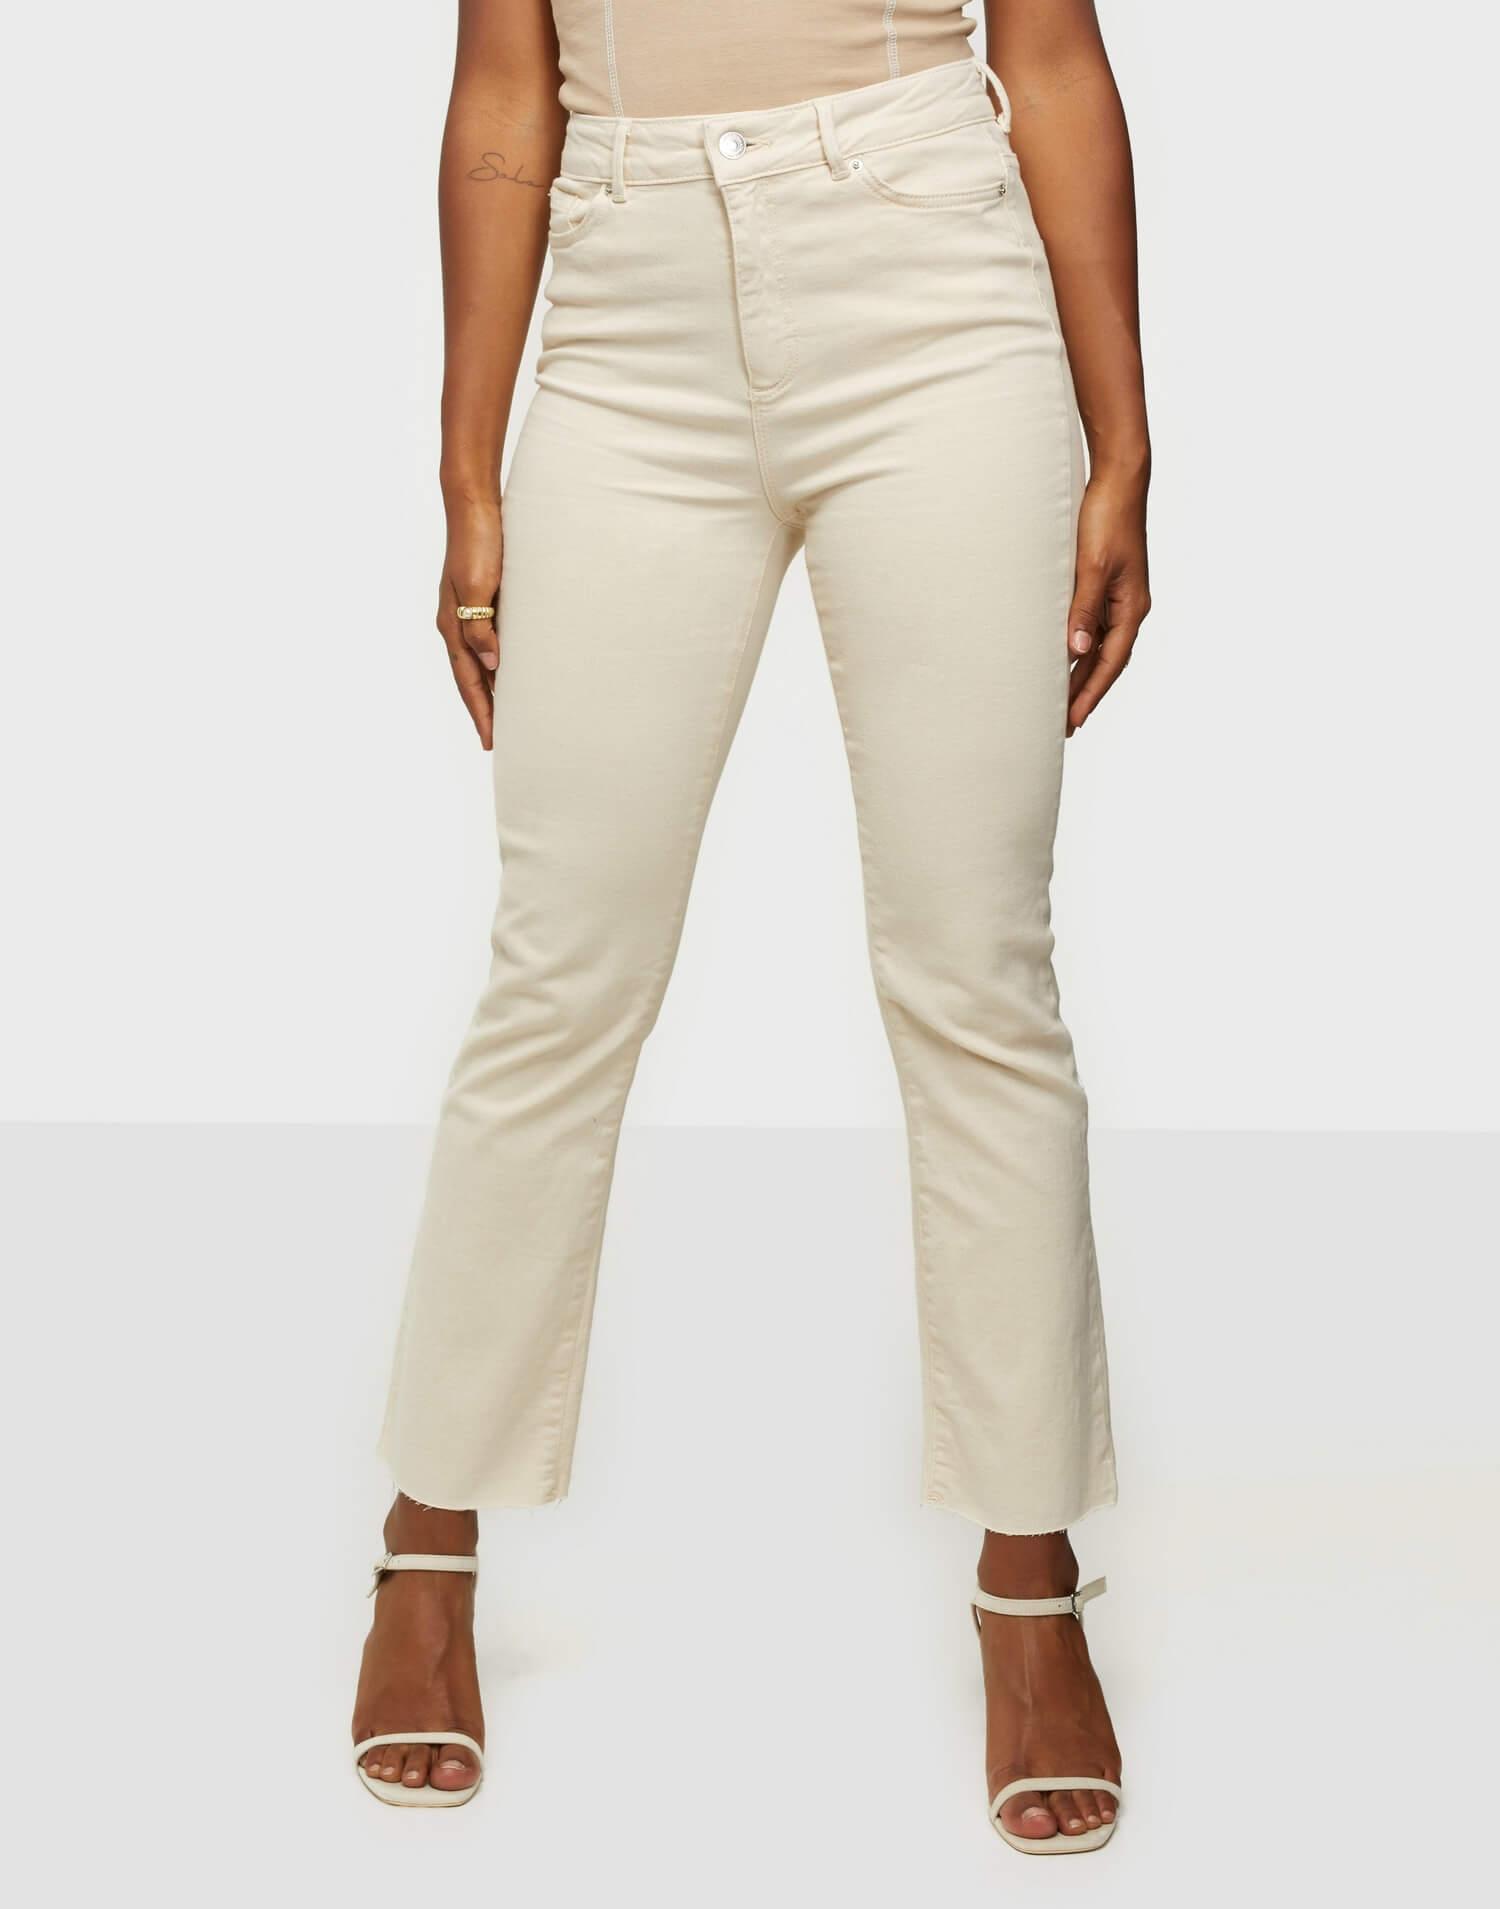 Beigea jeans i kick flare-modell från Vero Moda.